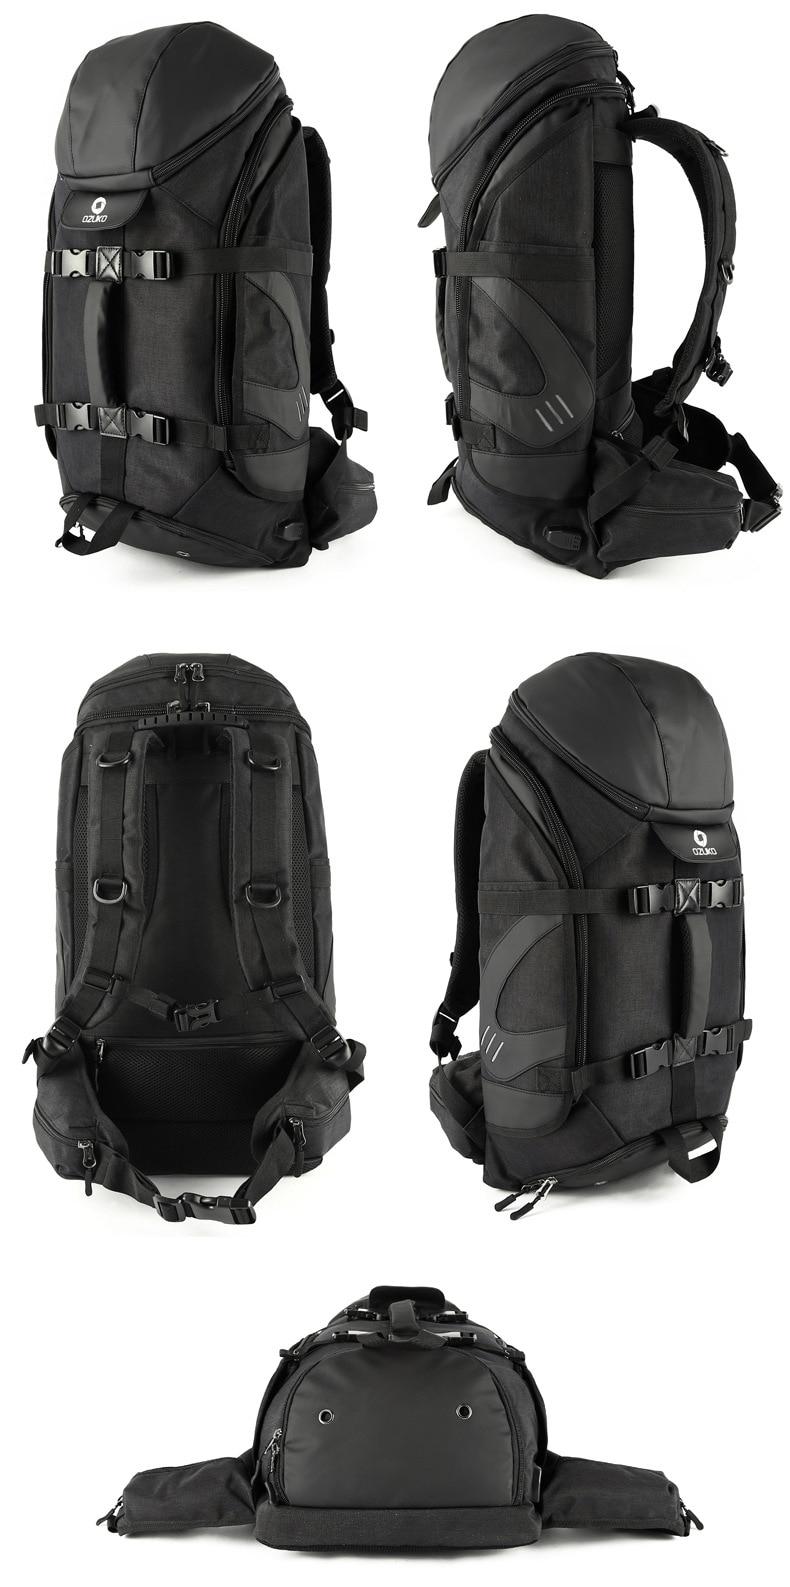 grande capacidade saco do portátil mochila multifuncional